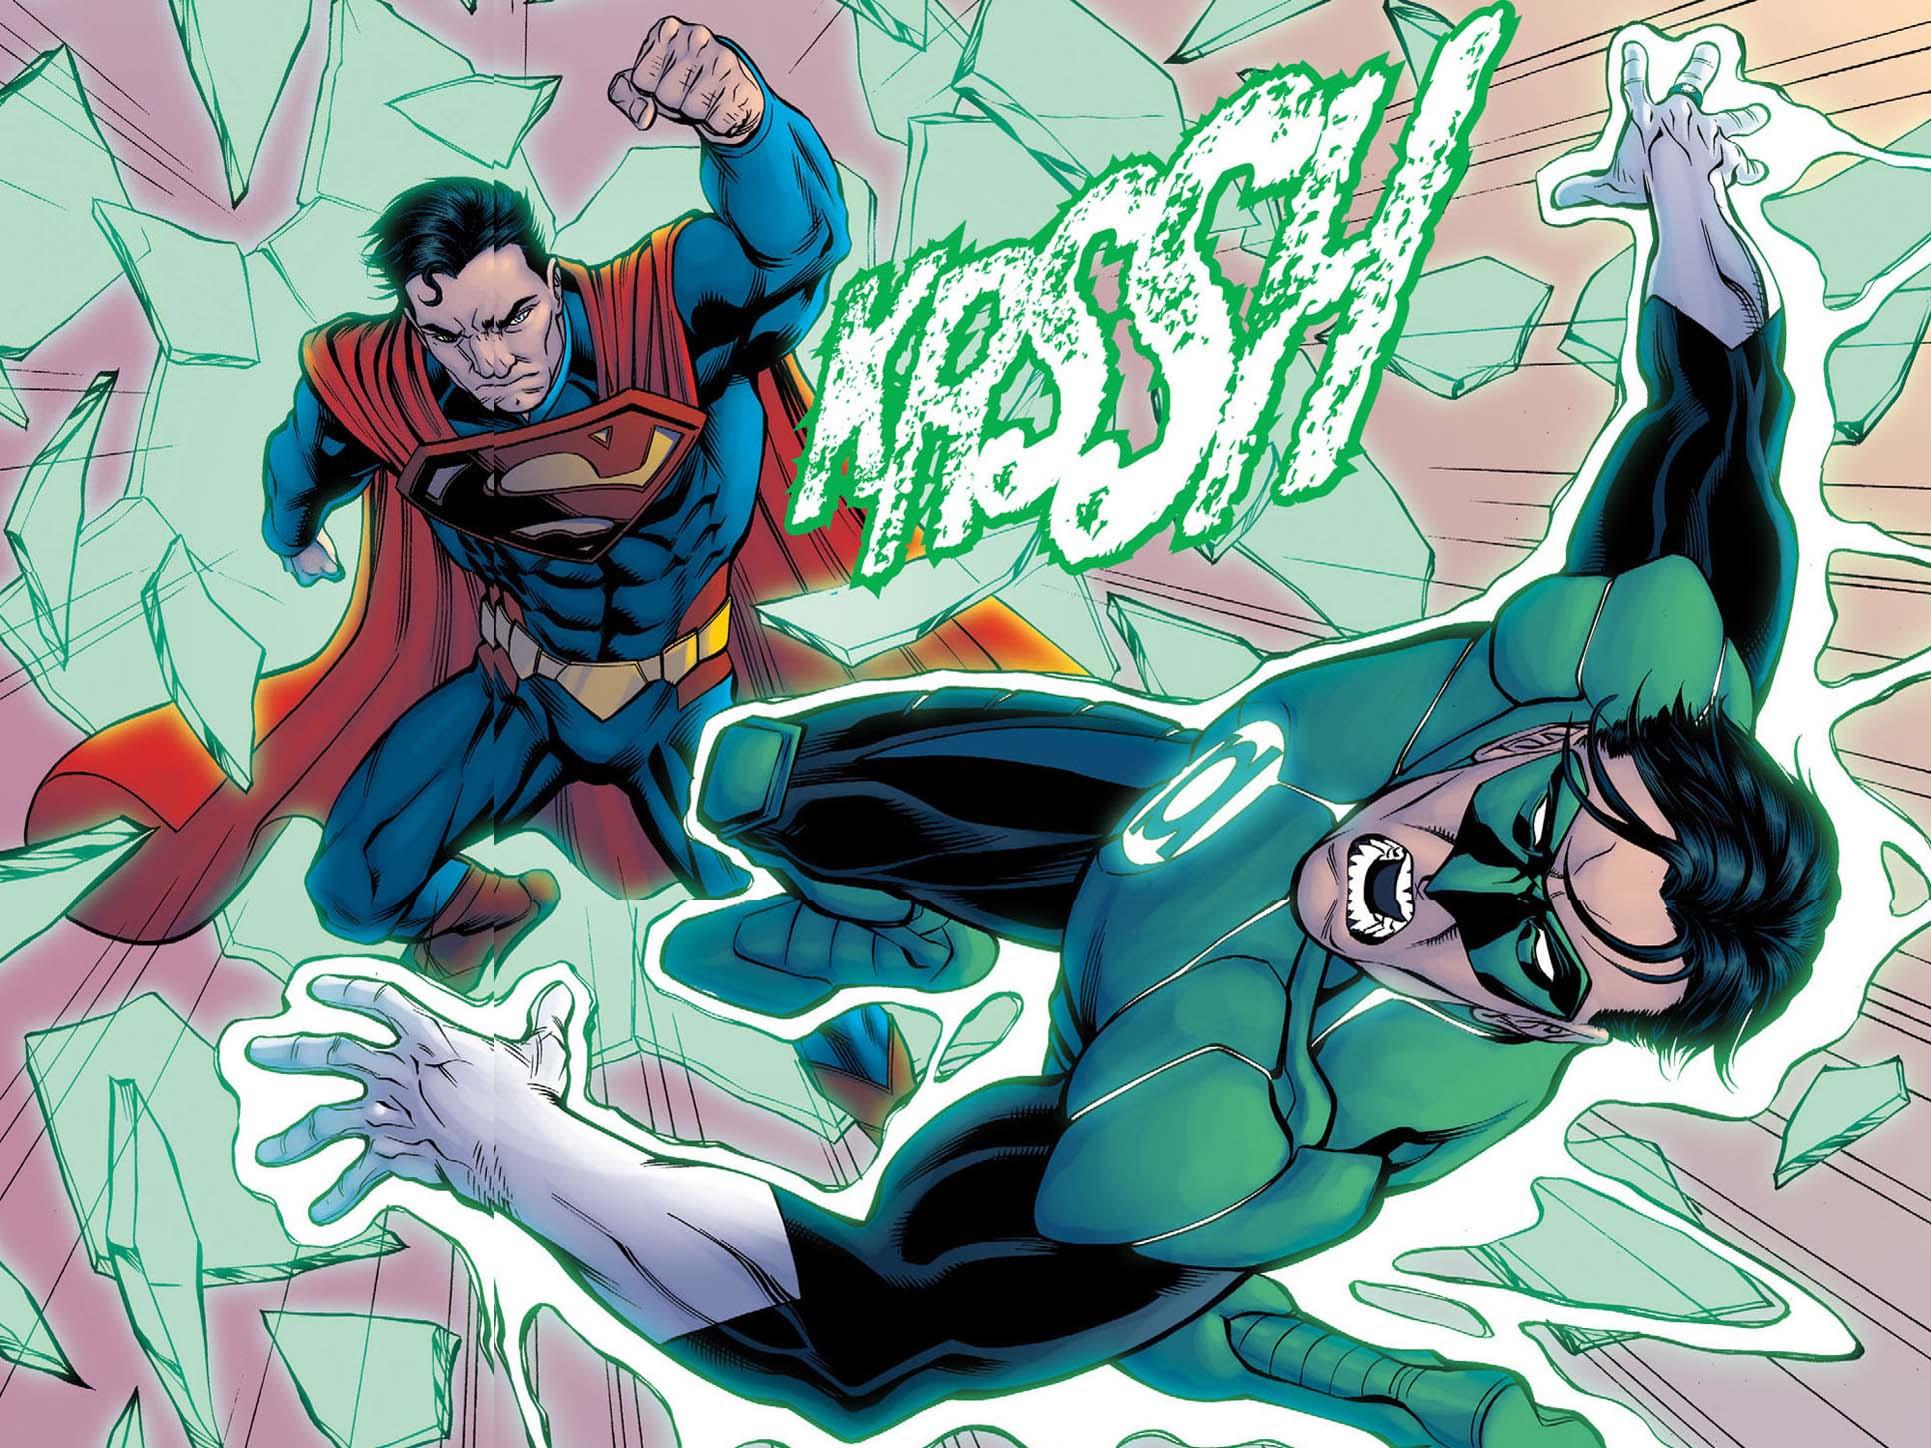 Superman vs green lantern - photo#1